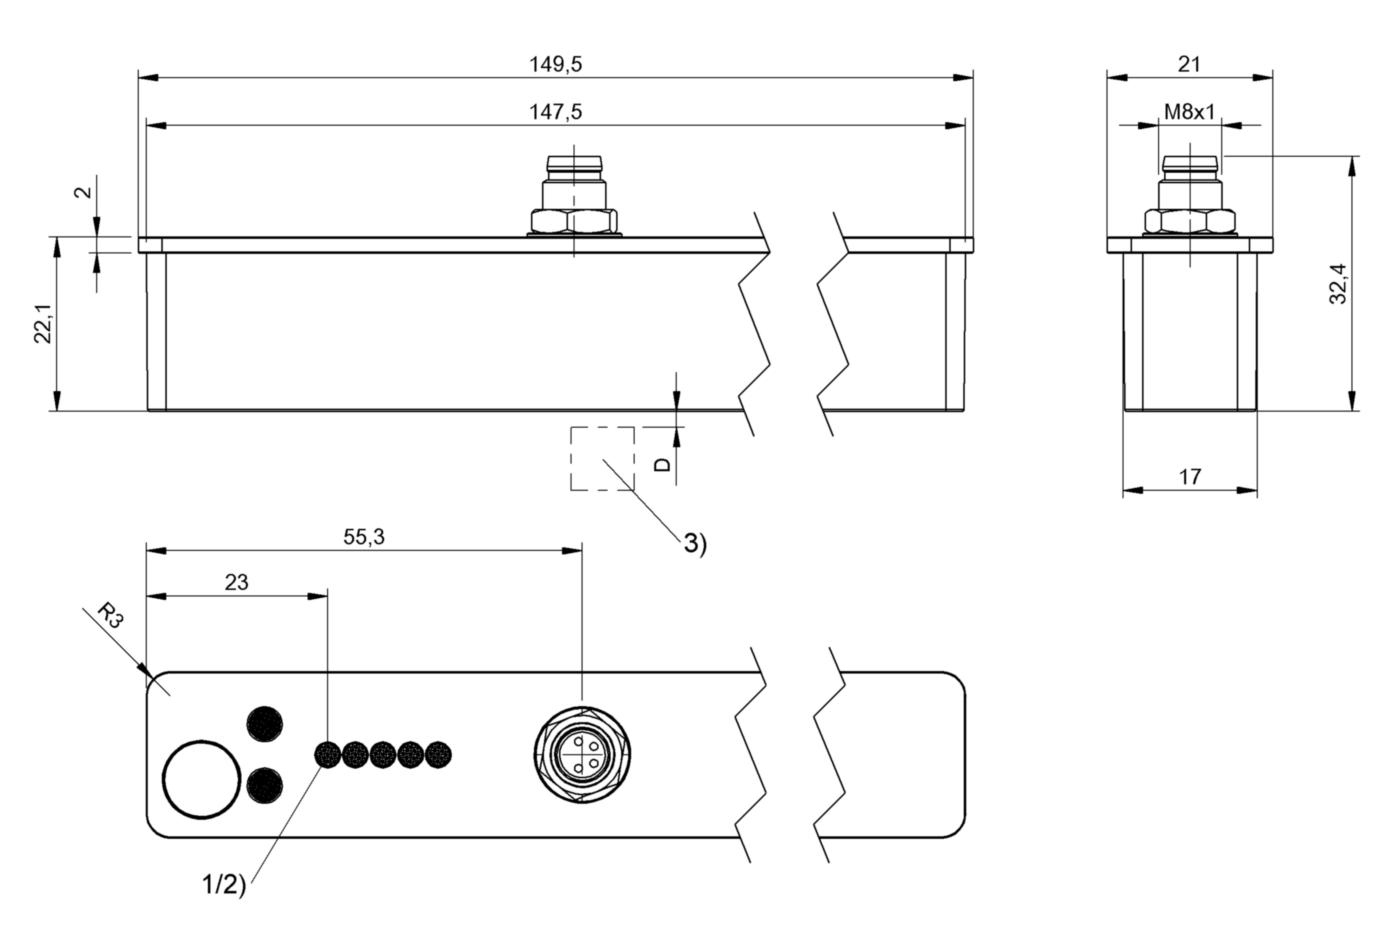 BIP001F - BIP LD2-T133-03-S75 - Balluff on danfoss wiring diagram, bendix wiring diagram, dayton wiring diagram, bourns wiring diagram, amphenol wiring diagram, atlas copco wiring diagram, square d wiring diagram, smc wiring diagram, siemens wiring diagram, enerpac wiring diagram, panasonic wiring diagram, general electric wiring diagram, fisher wiring diagram, mitsubishi wiring diagram, toshiba wiring diagram, emerson wiring diagram, bosch wiring diagram, alpha wiring diagram, durant wiring diagram, sony wiring diagram,